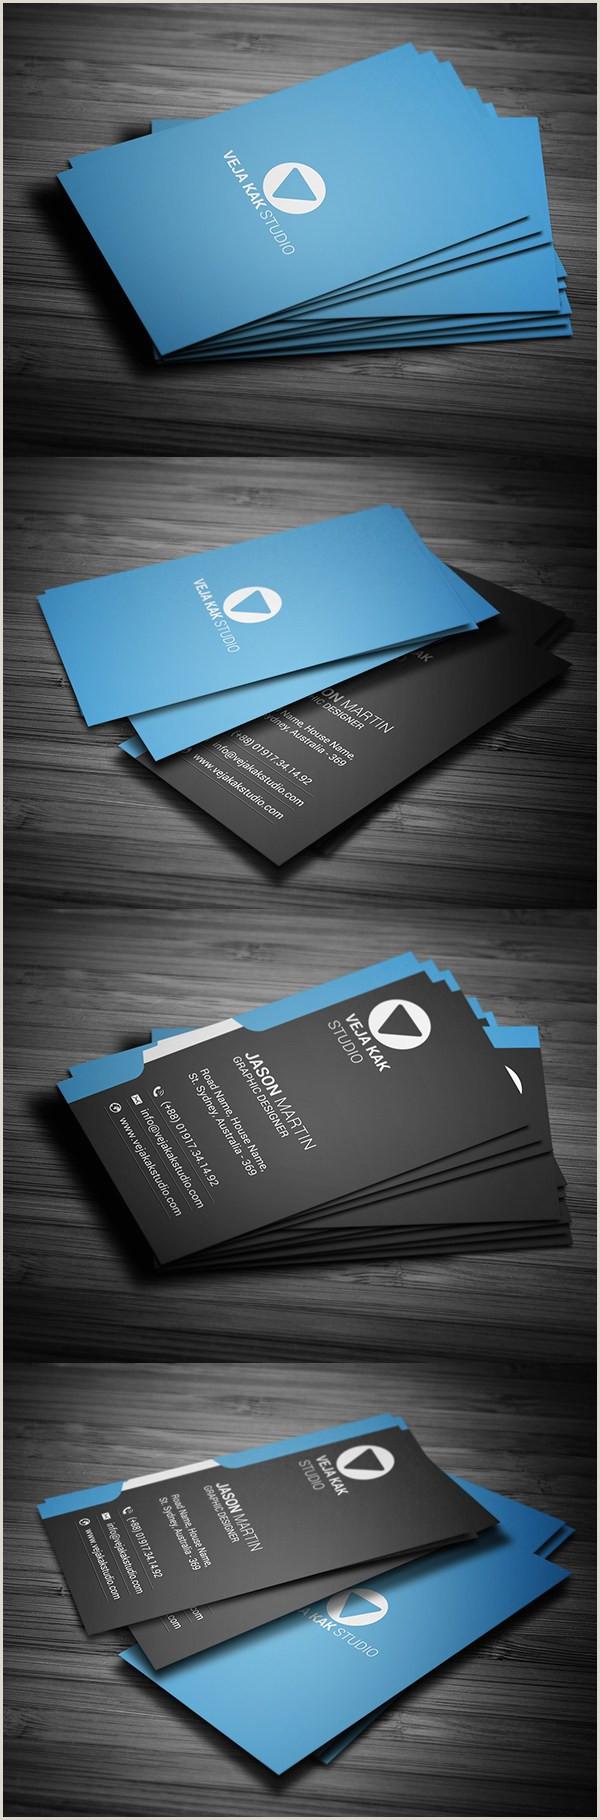 Unique Graphic Designer Business Cards Modern Vertical Business Card